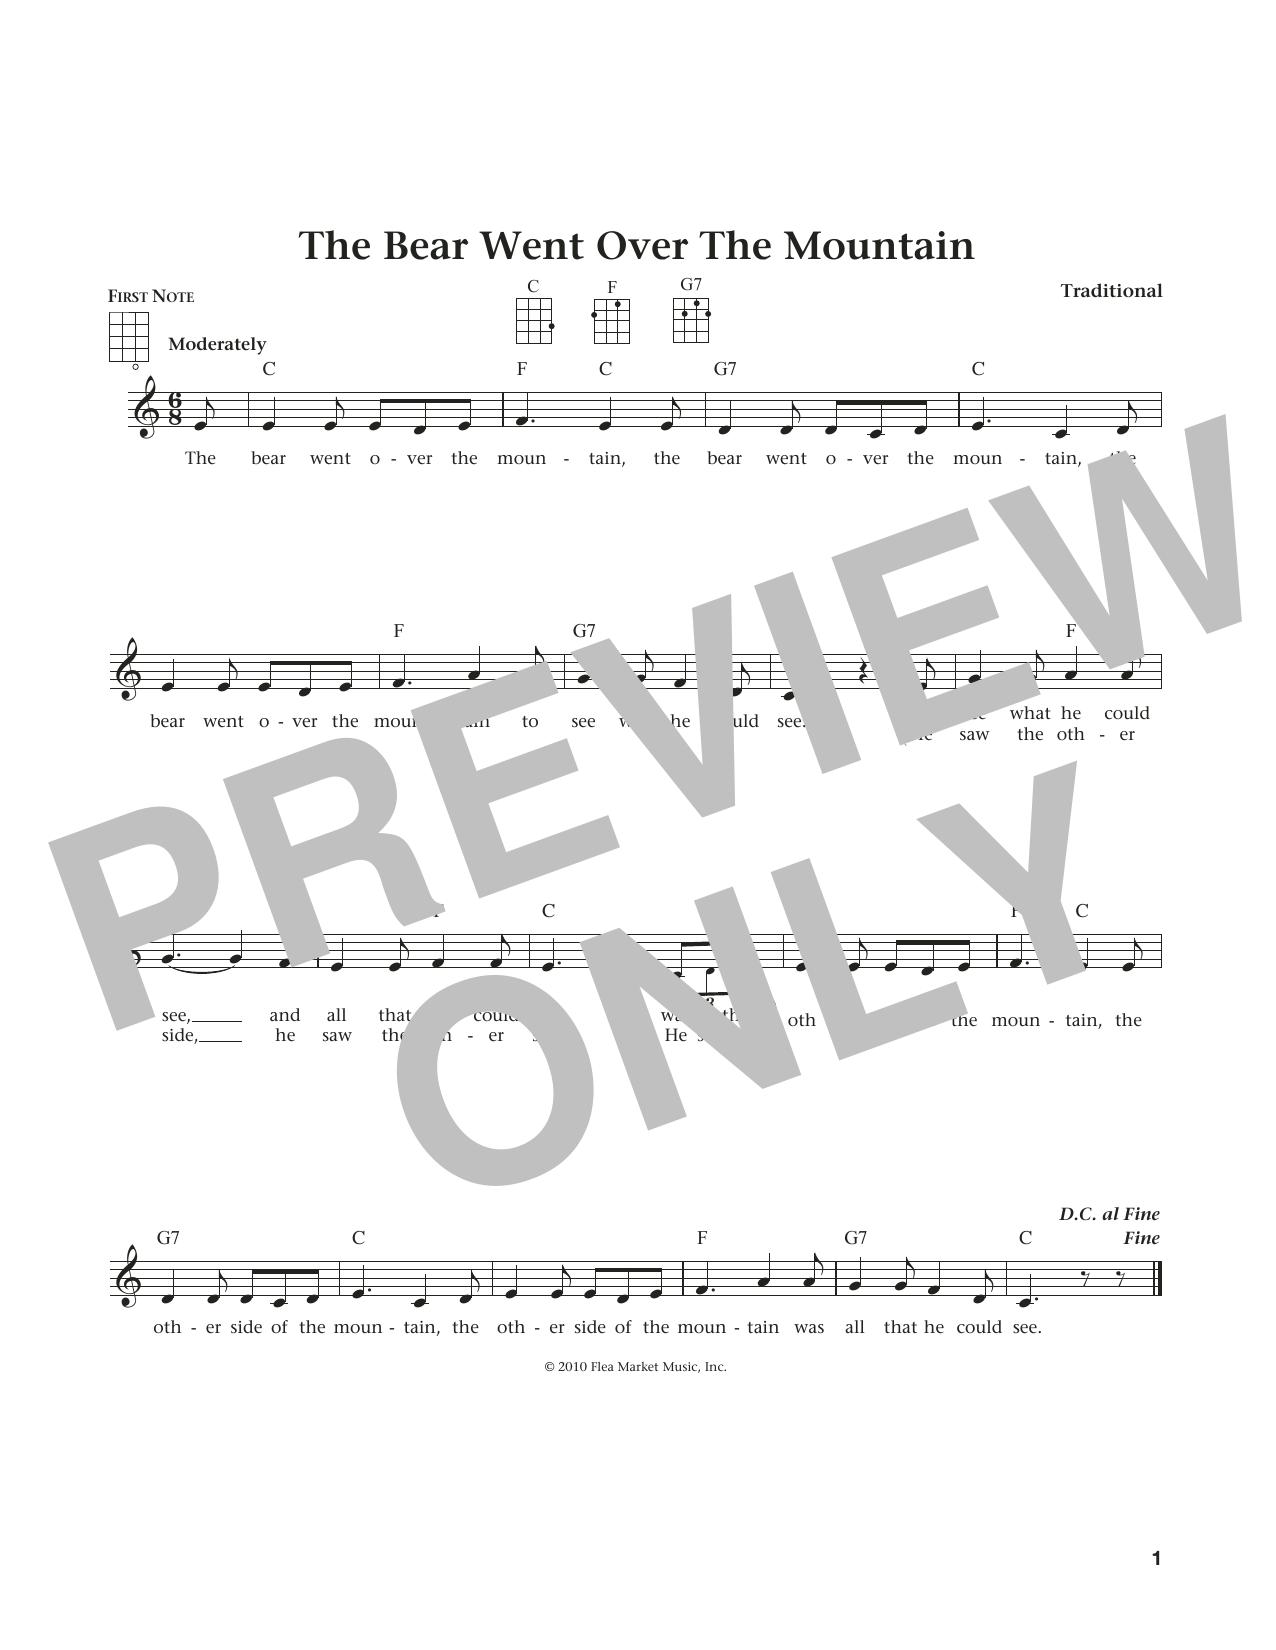 The Bear Went Over The Mountain (from The Daily Ukulele) (arr. Liz and Jim Beloff) (Ukulele)